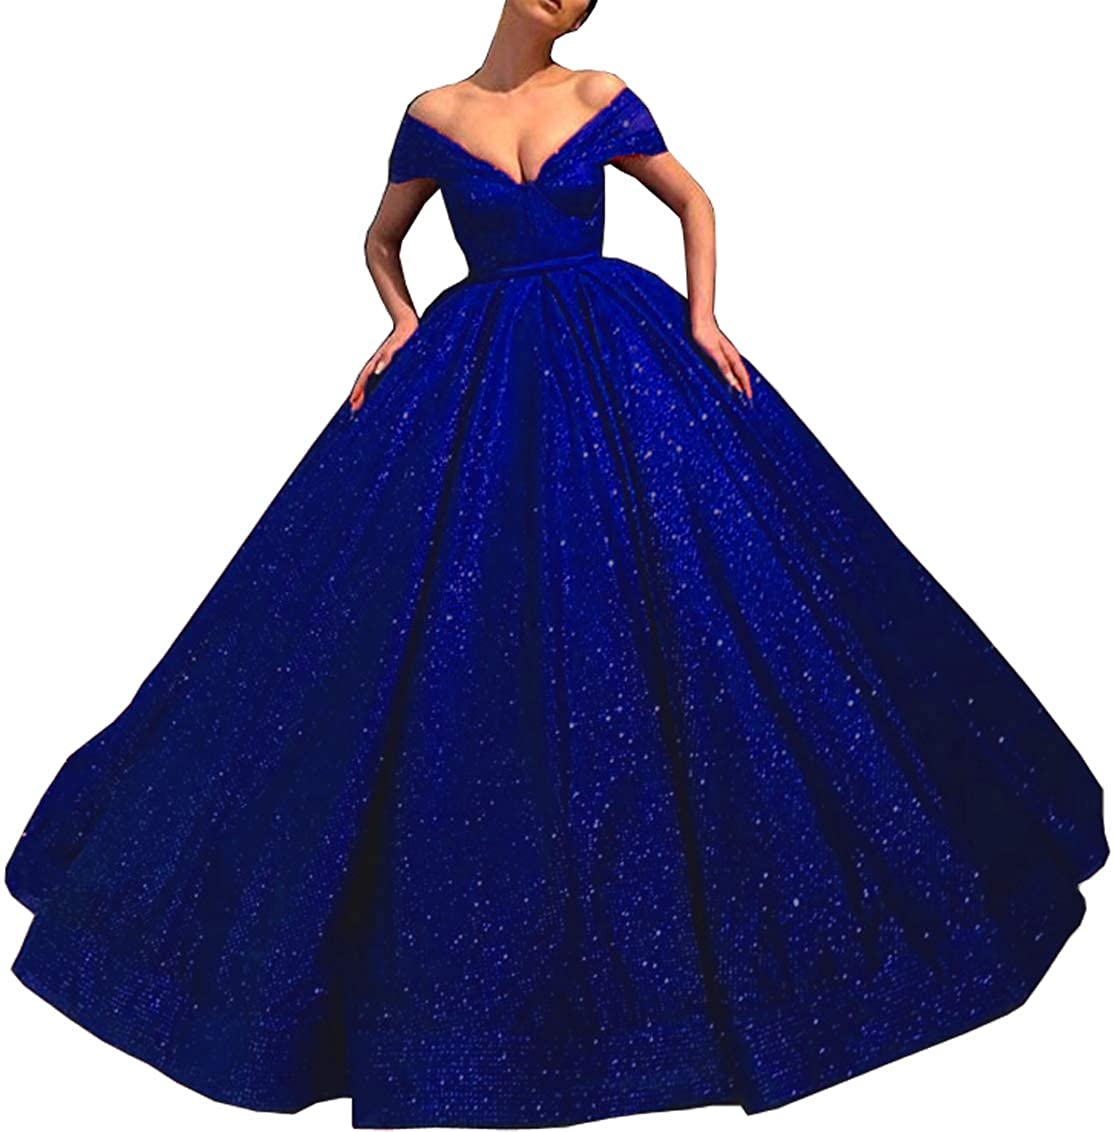 Meijia Handicraft Meijia Prom Dress Strap Evening Ball Gowns For Wedding Me066